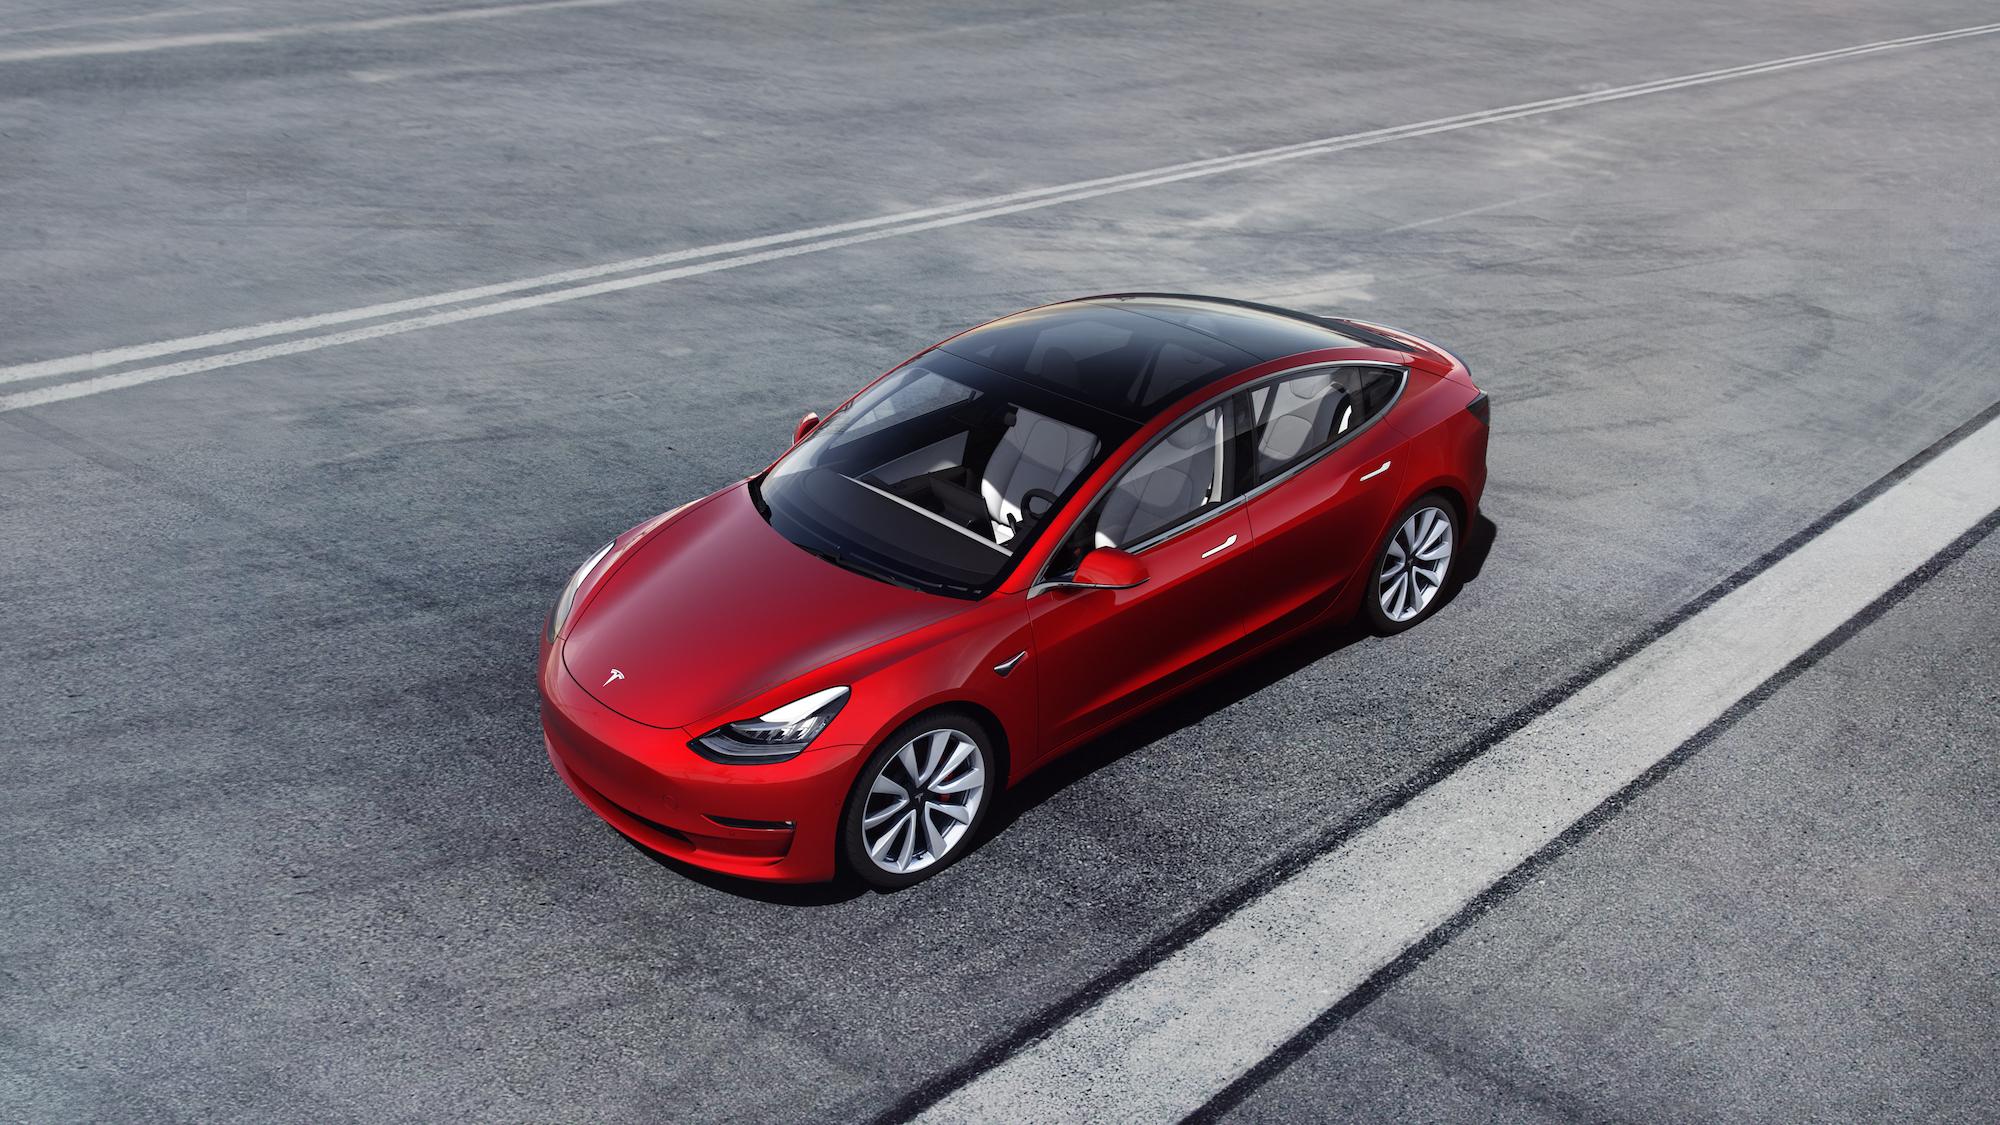 Tesla Model 3: One of the World's Safest Cars?